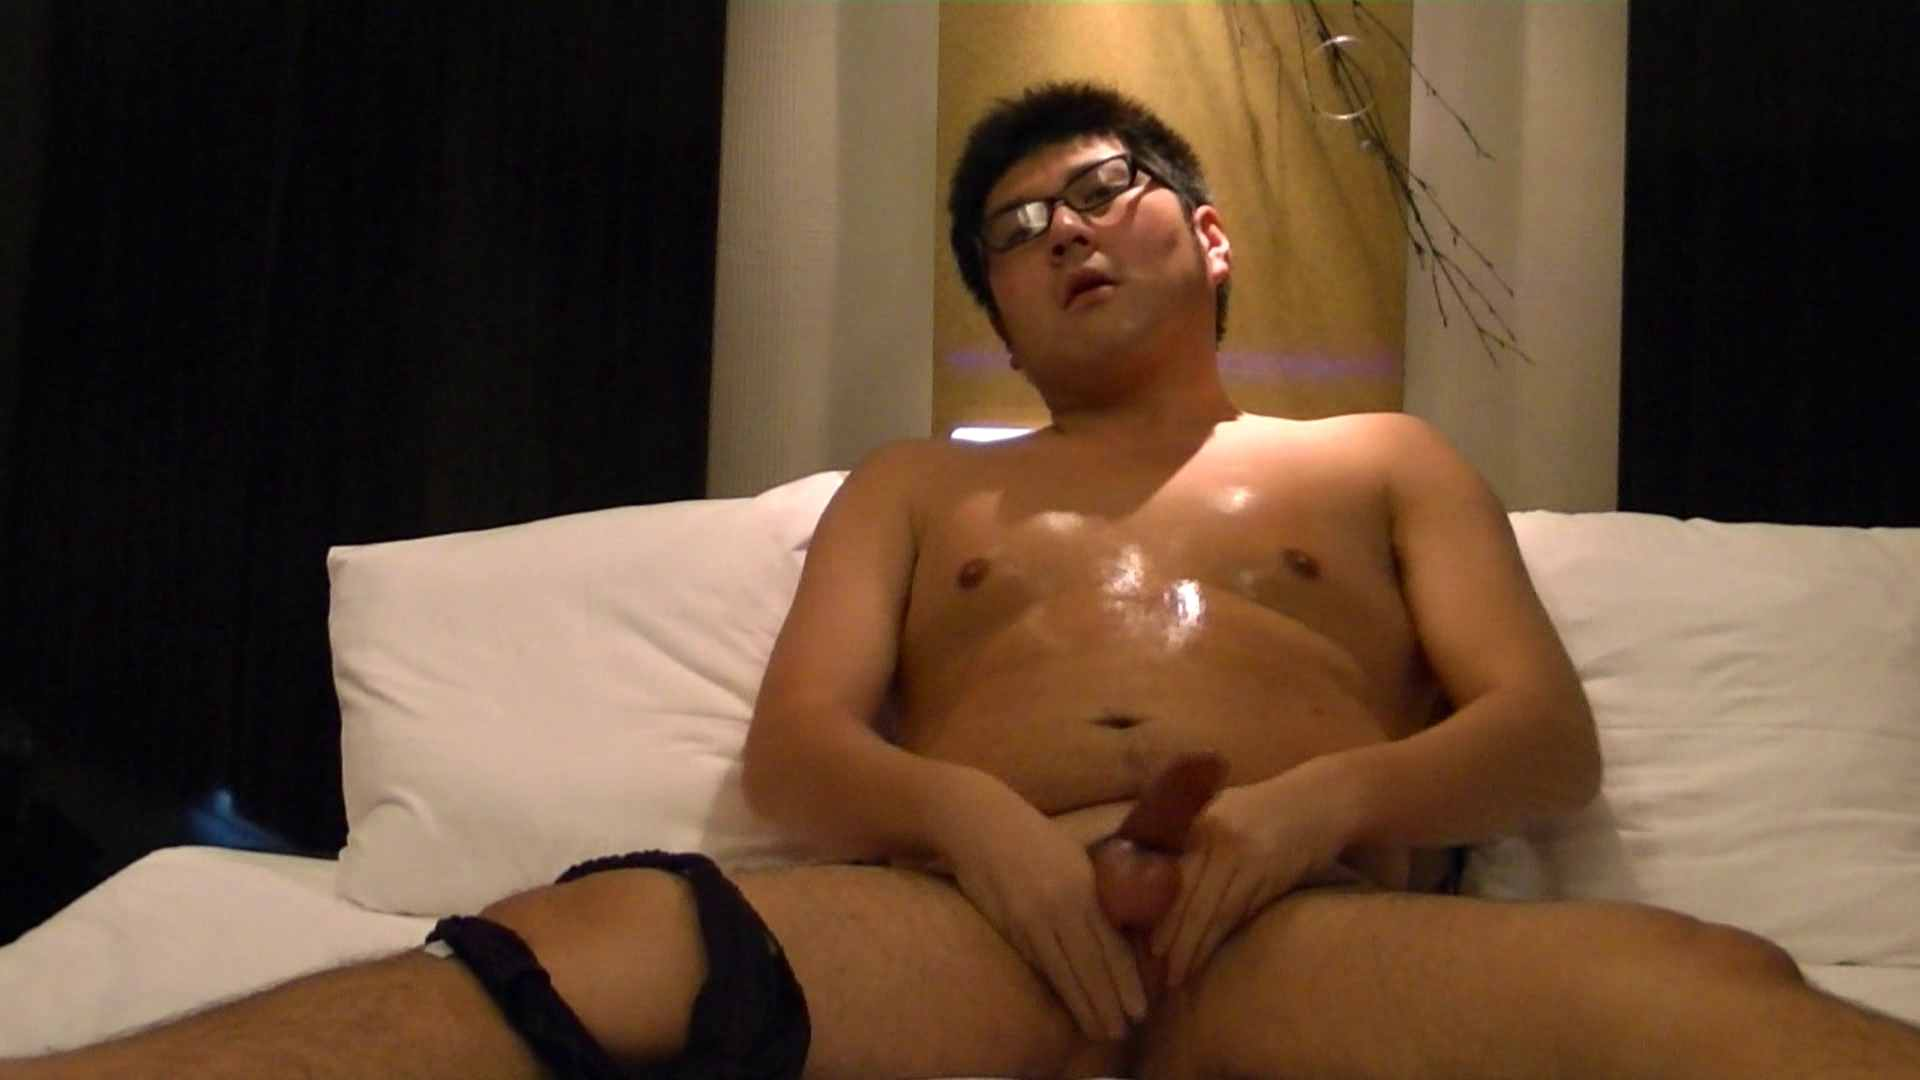 Mr.オナックスさん投稿!HD 貴方のオナニー三万円で撮影させてください。VOL.02 前編 ガチムチマッチョ系メンズ ゲイフリーエロ画像 11画像 11